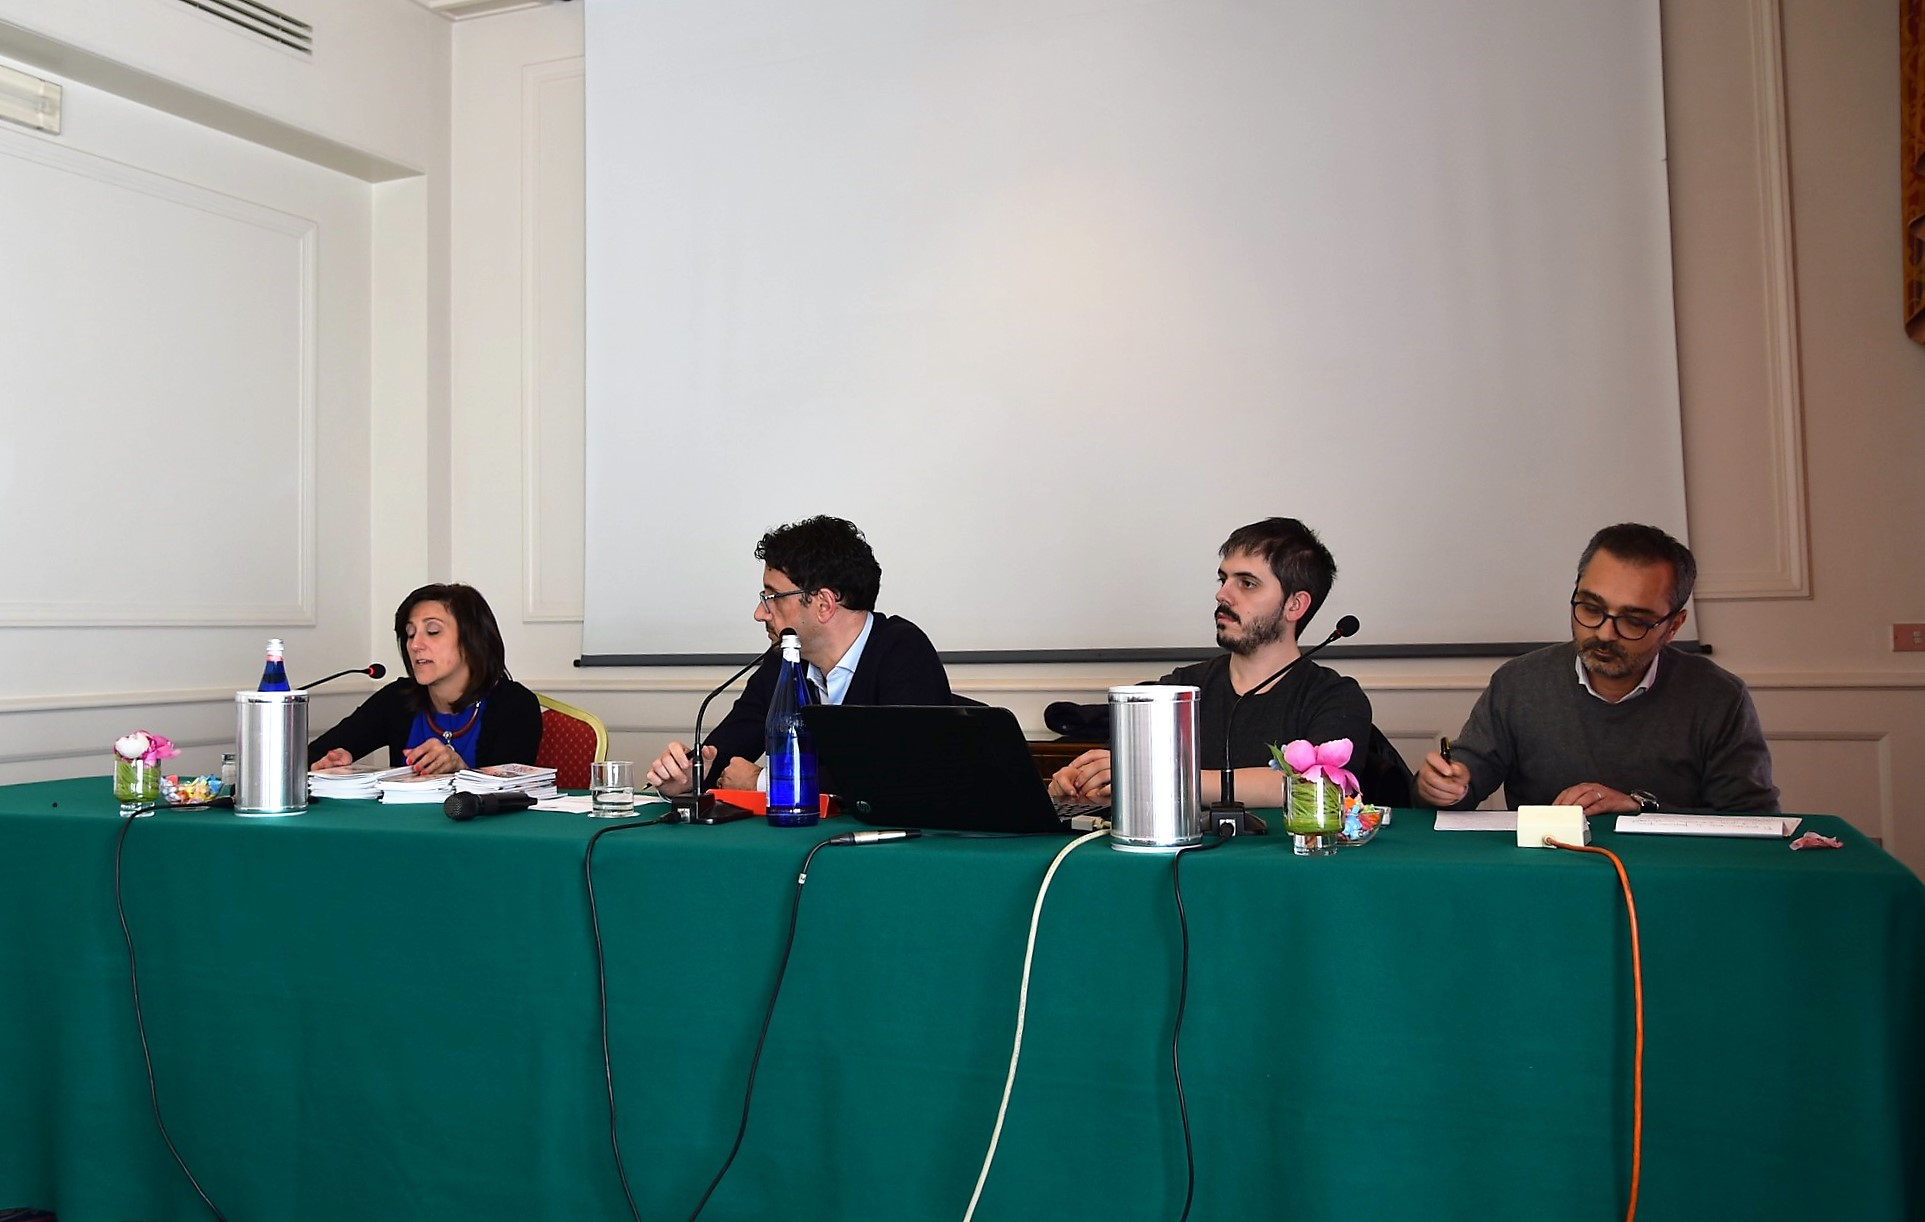 Elena Gaiani, Alberto Garnero, Alessandro Bertola, Mario Serra